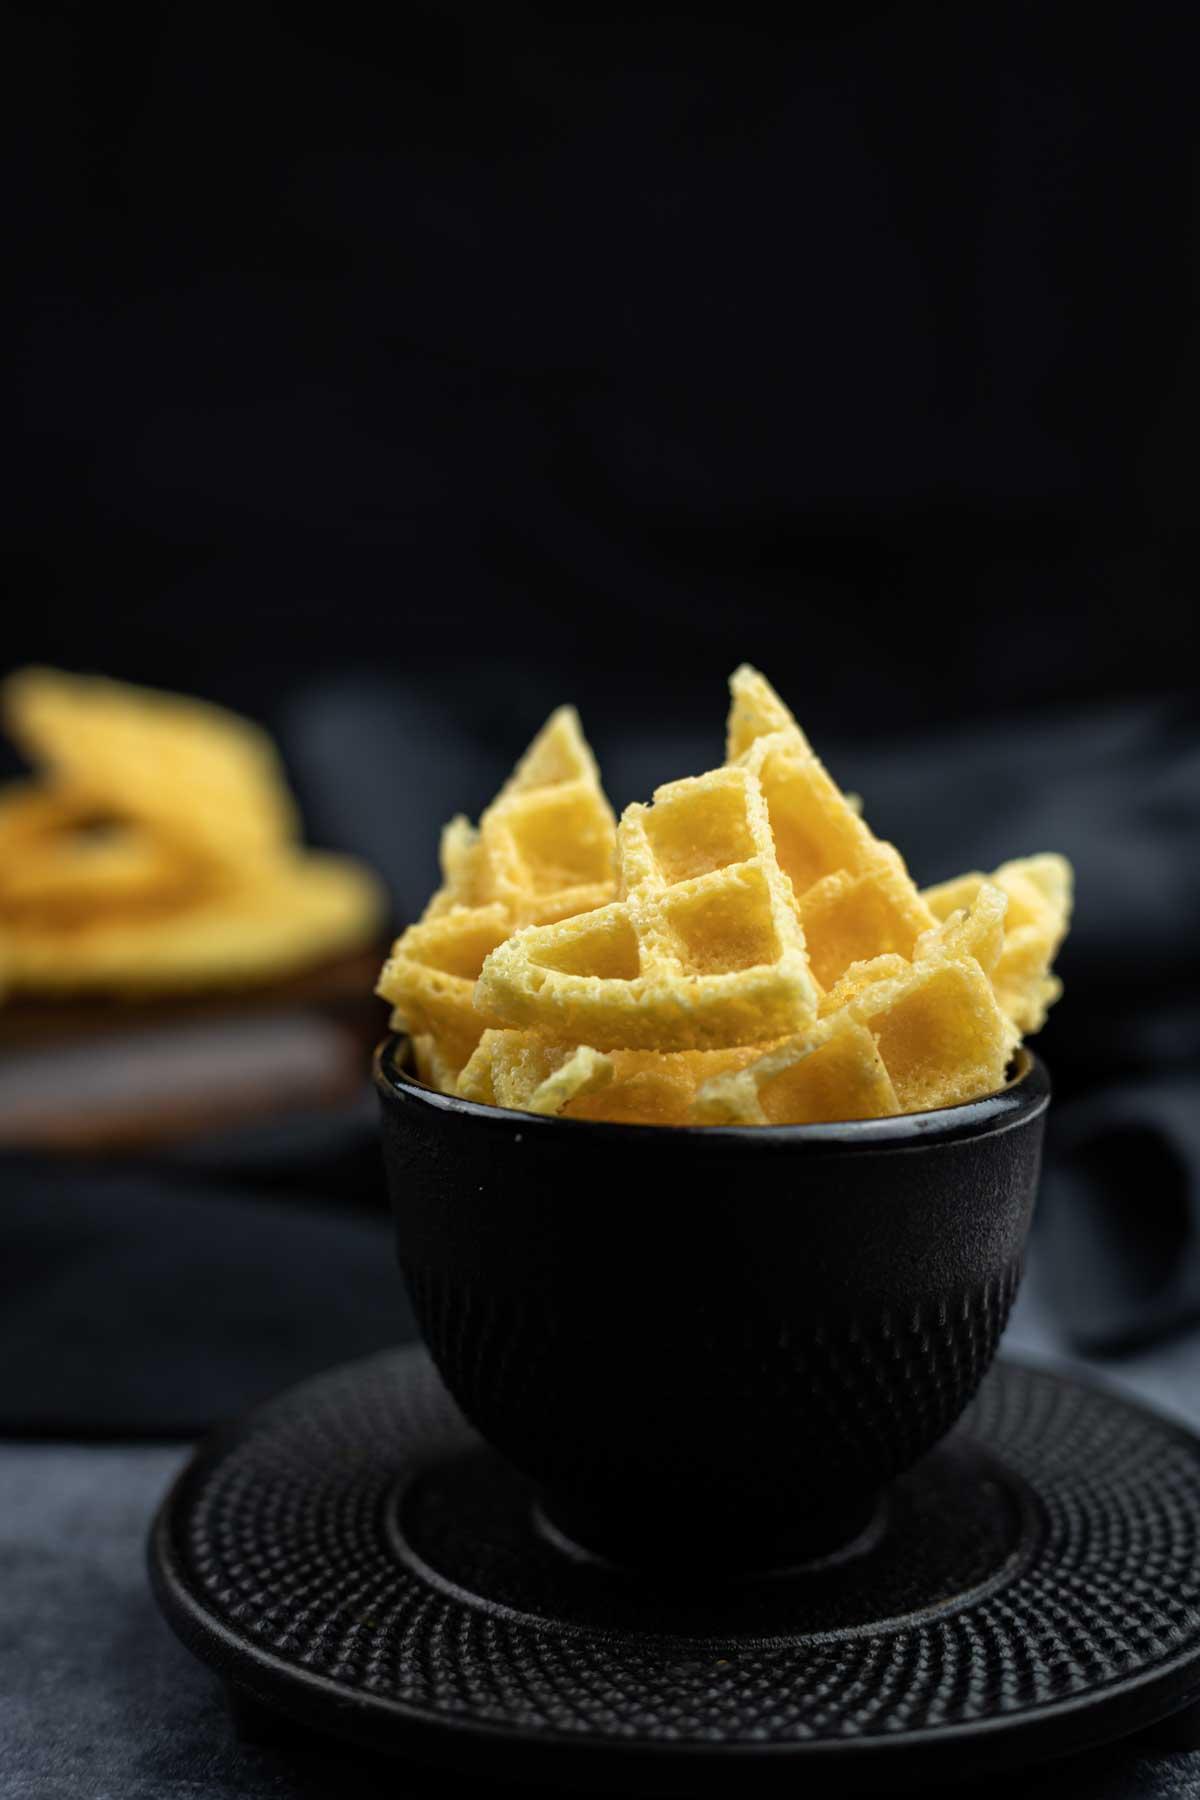 Keto Guacamole Chips in a black bowl